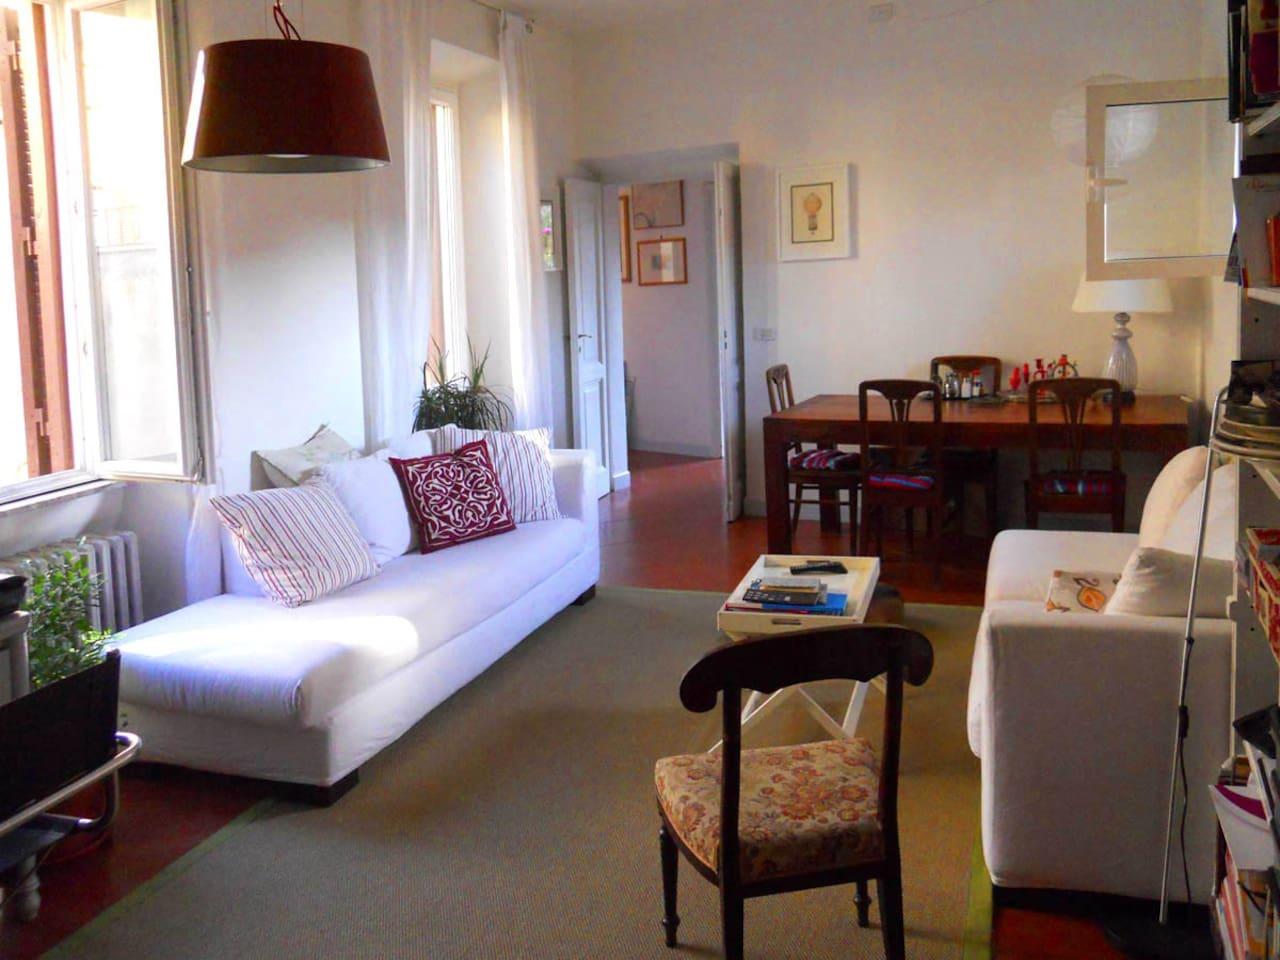 Stylish one bedroom in Trastevere